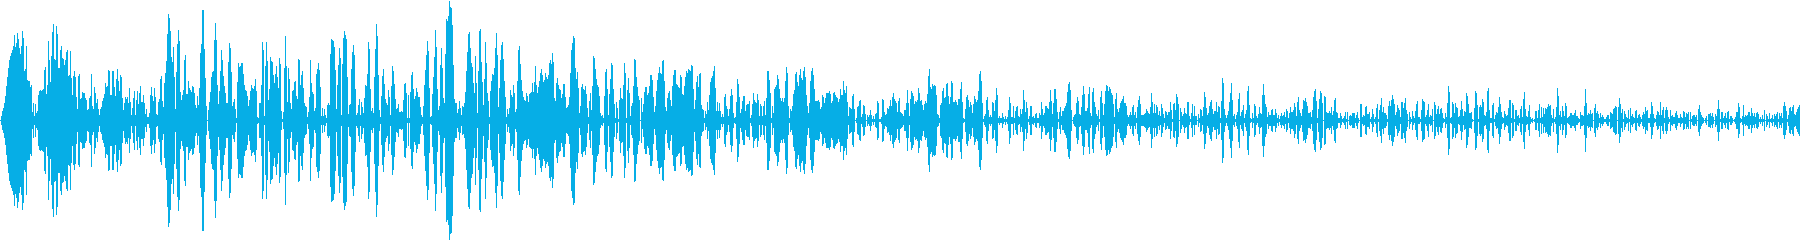 DTM Snare 8 オリジナル音源の再生済みの波形